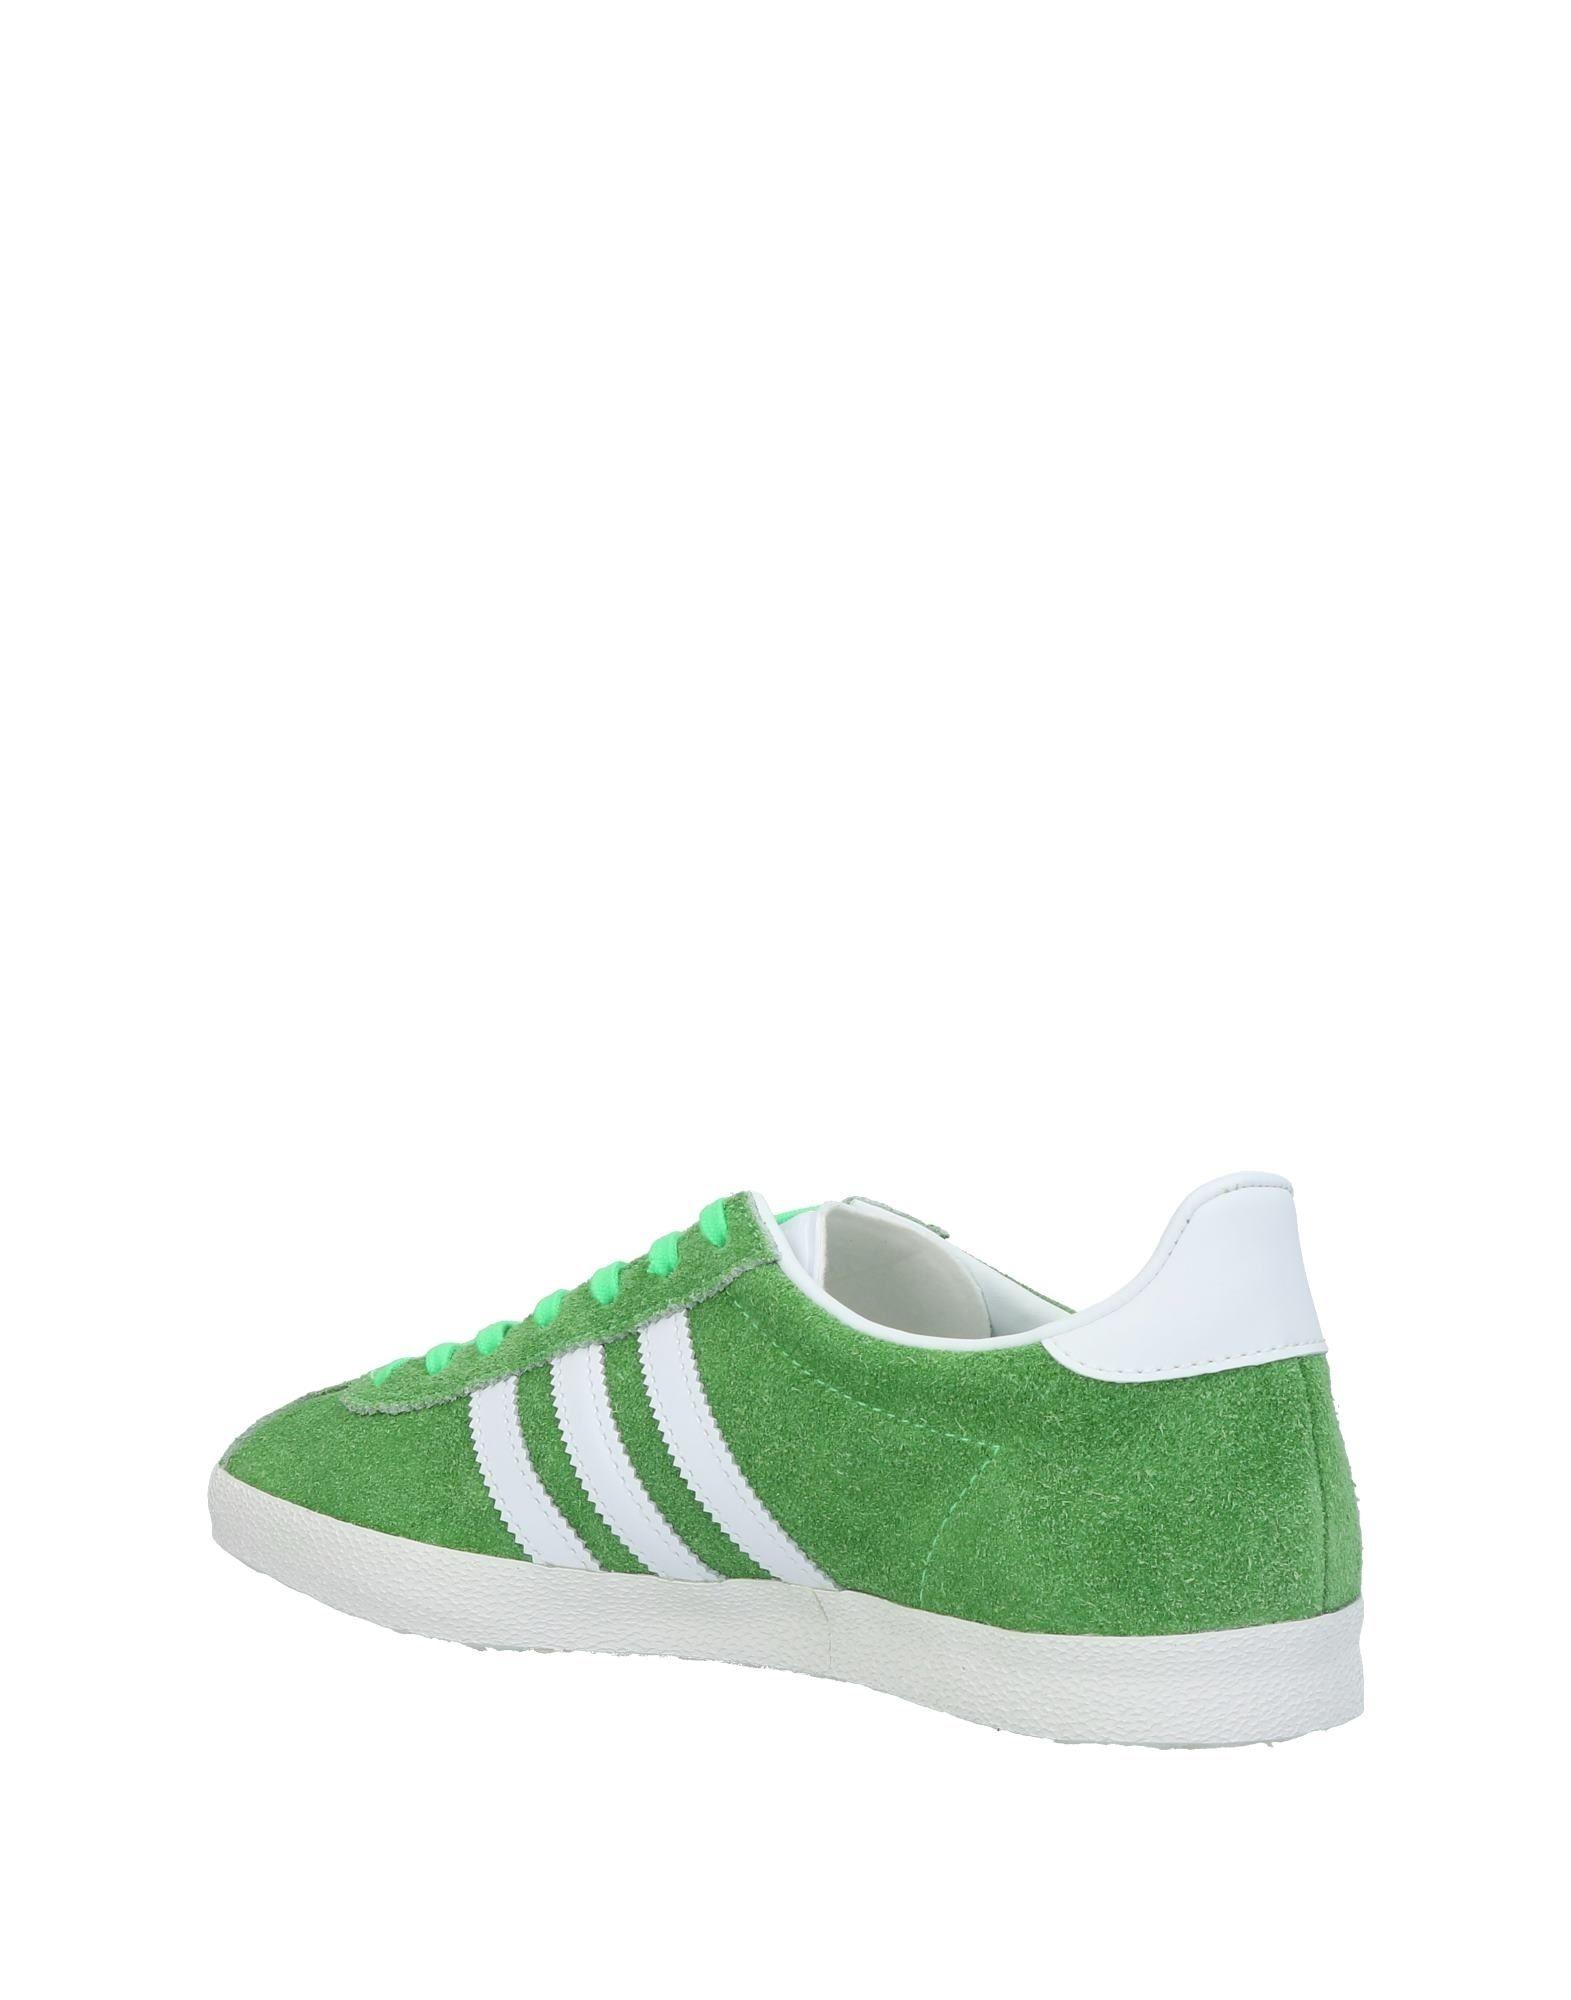 Adidas Originals Sneakers Herren    11448096UL Neue Schuhe 7a1a4a